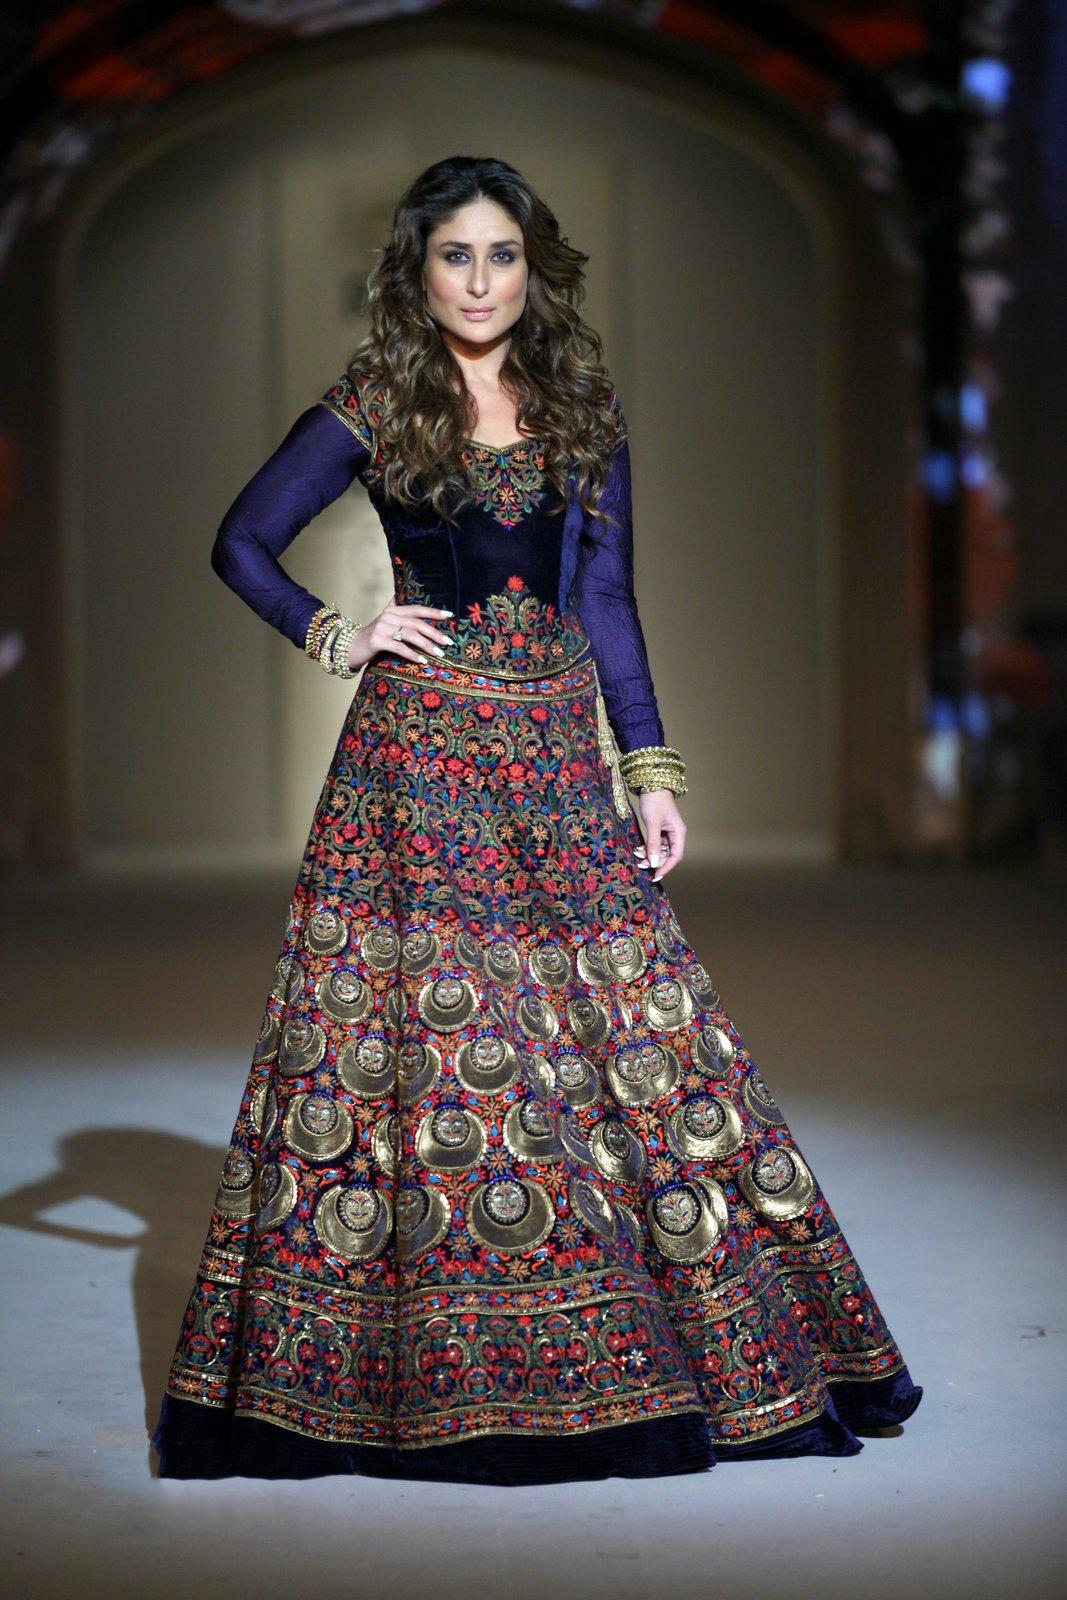 Kareena Kapoor Funny Photos In Blue Dress